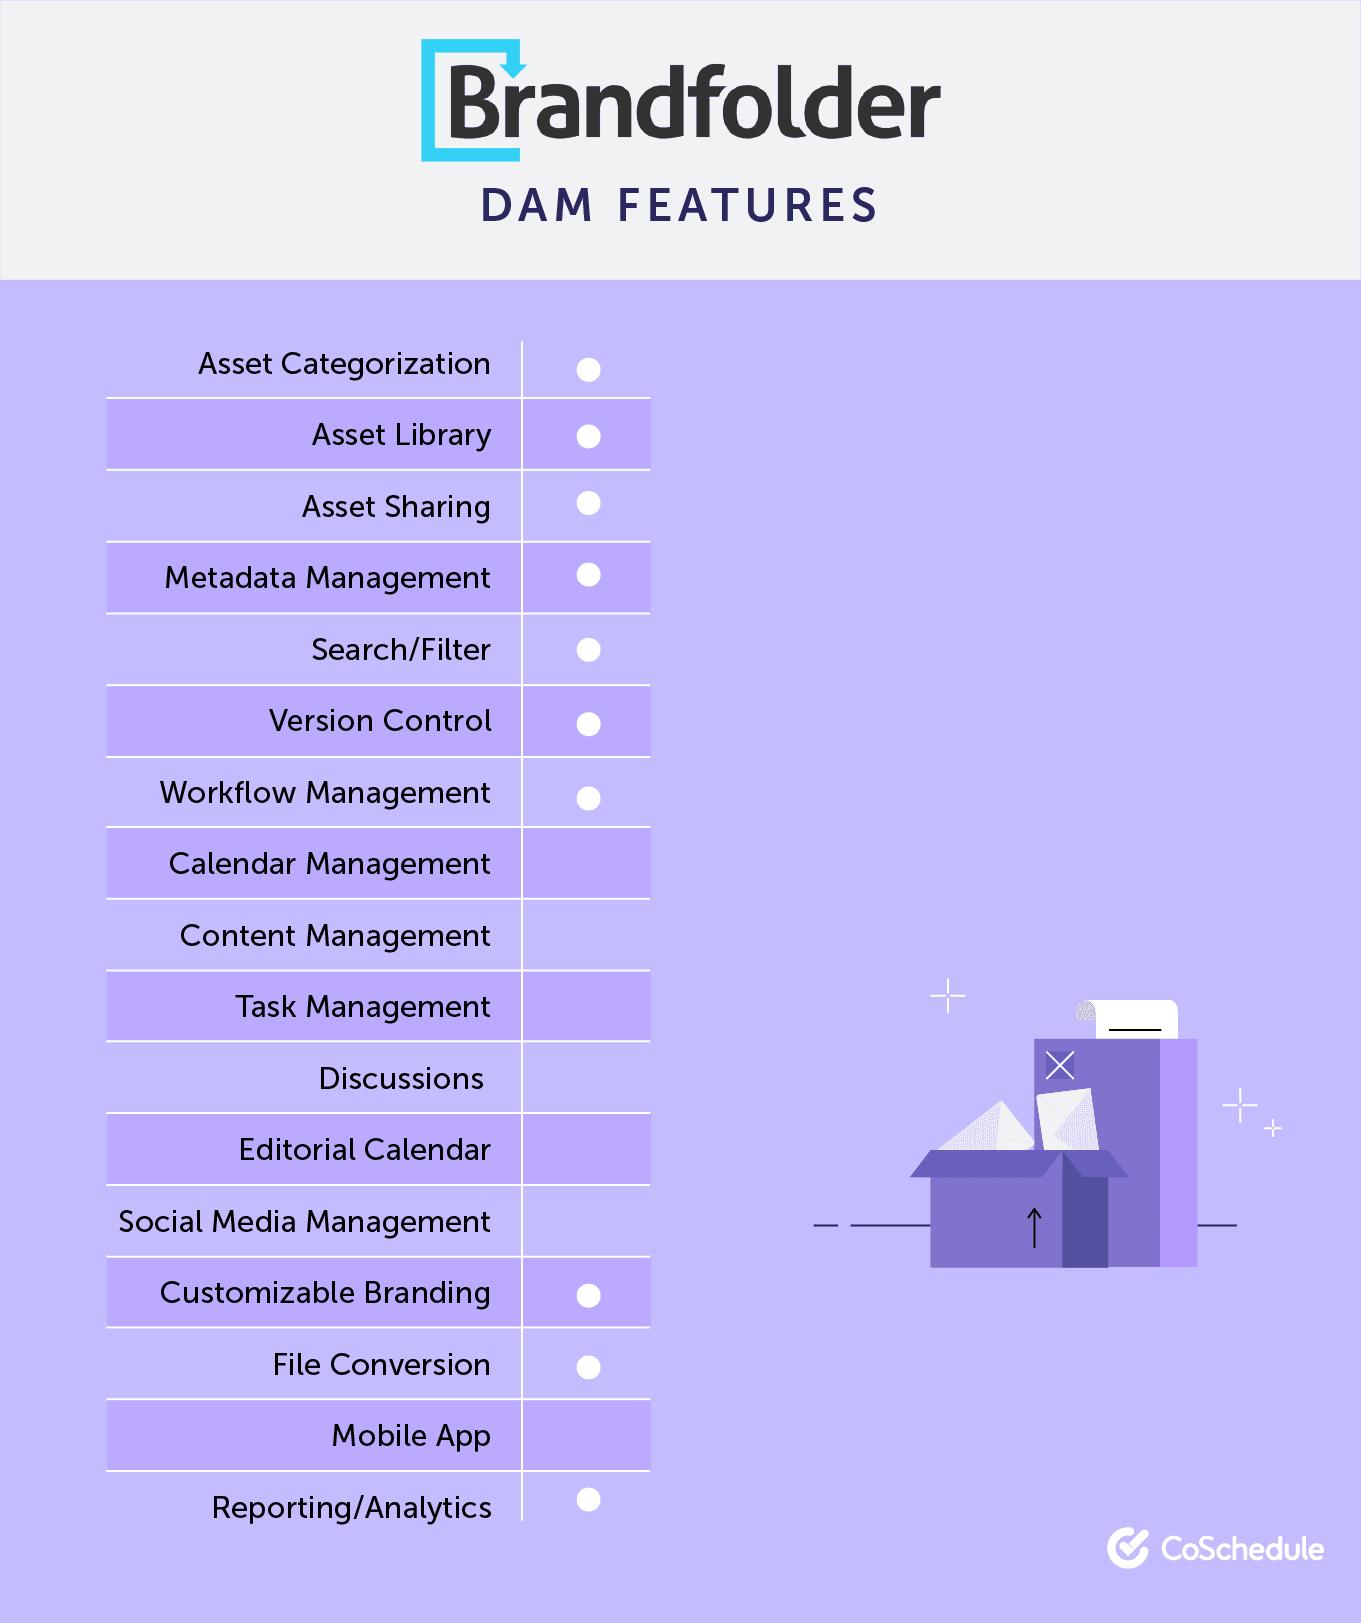 Brandfolder DAM Features